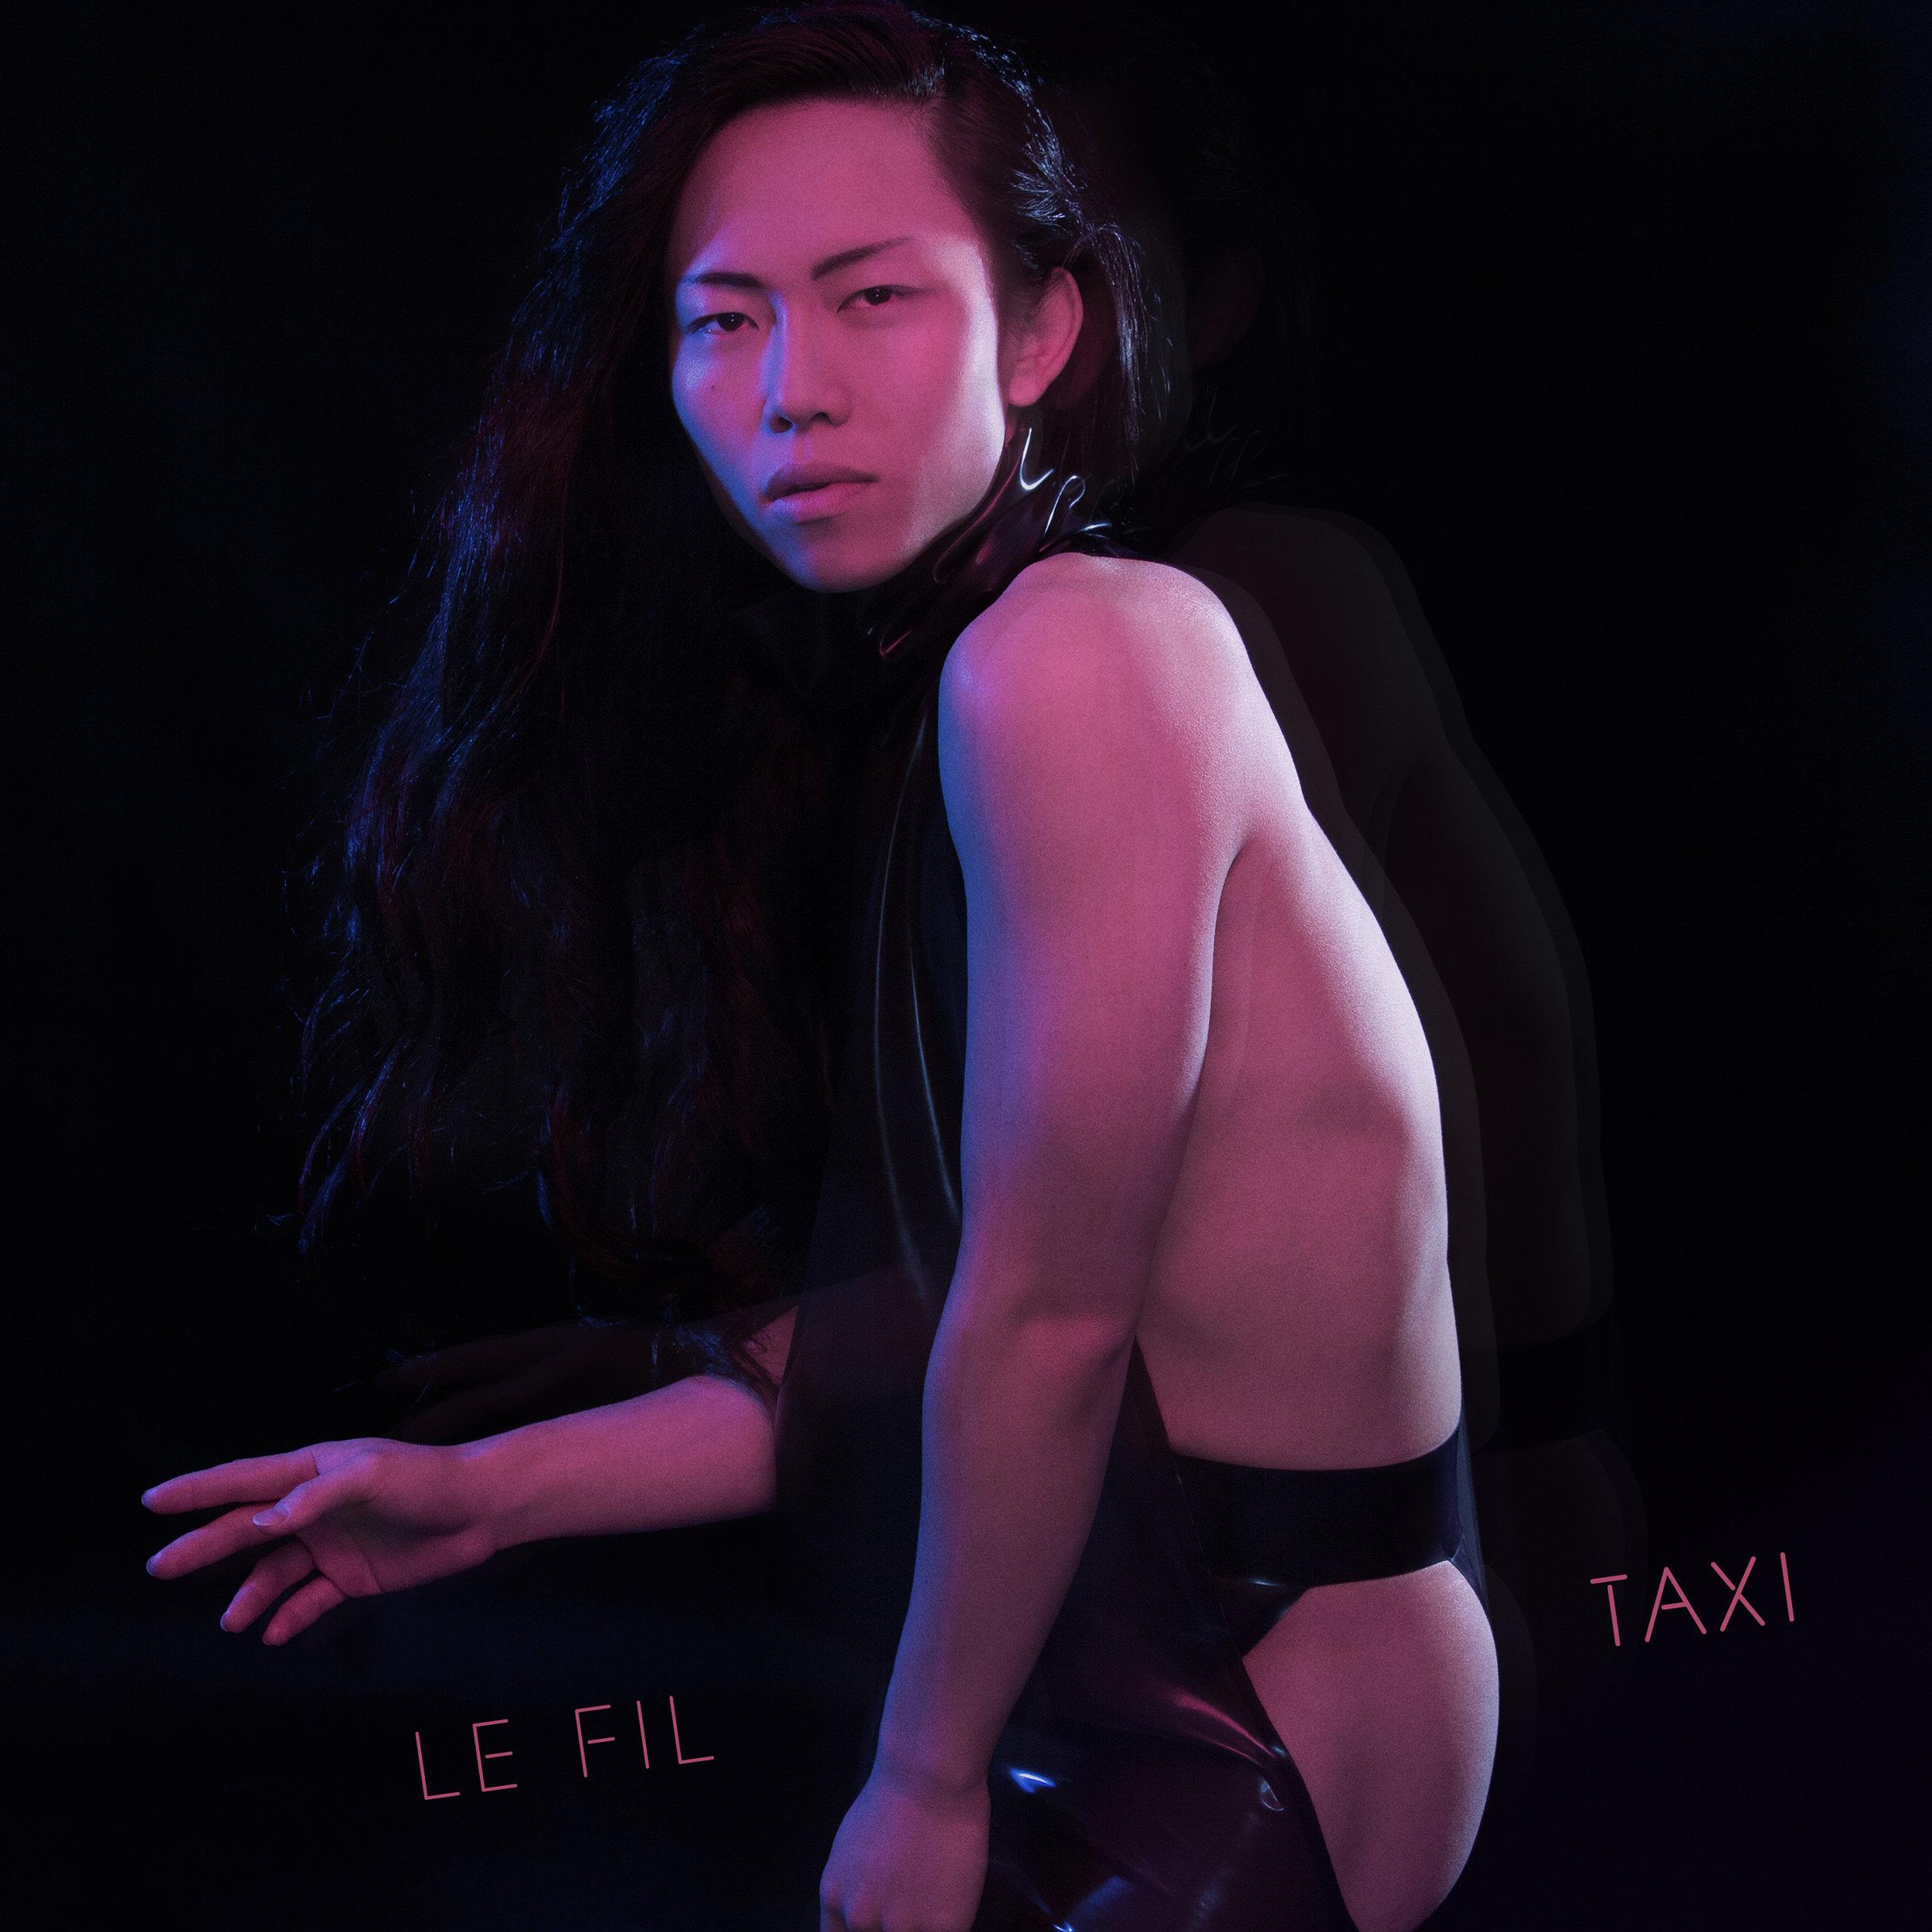 Le+Fil+Taxi+Cover.jpg